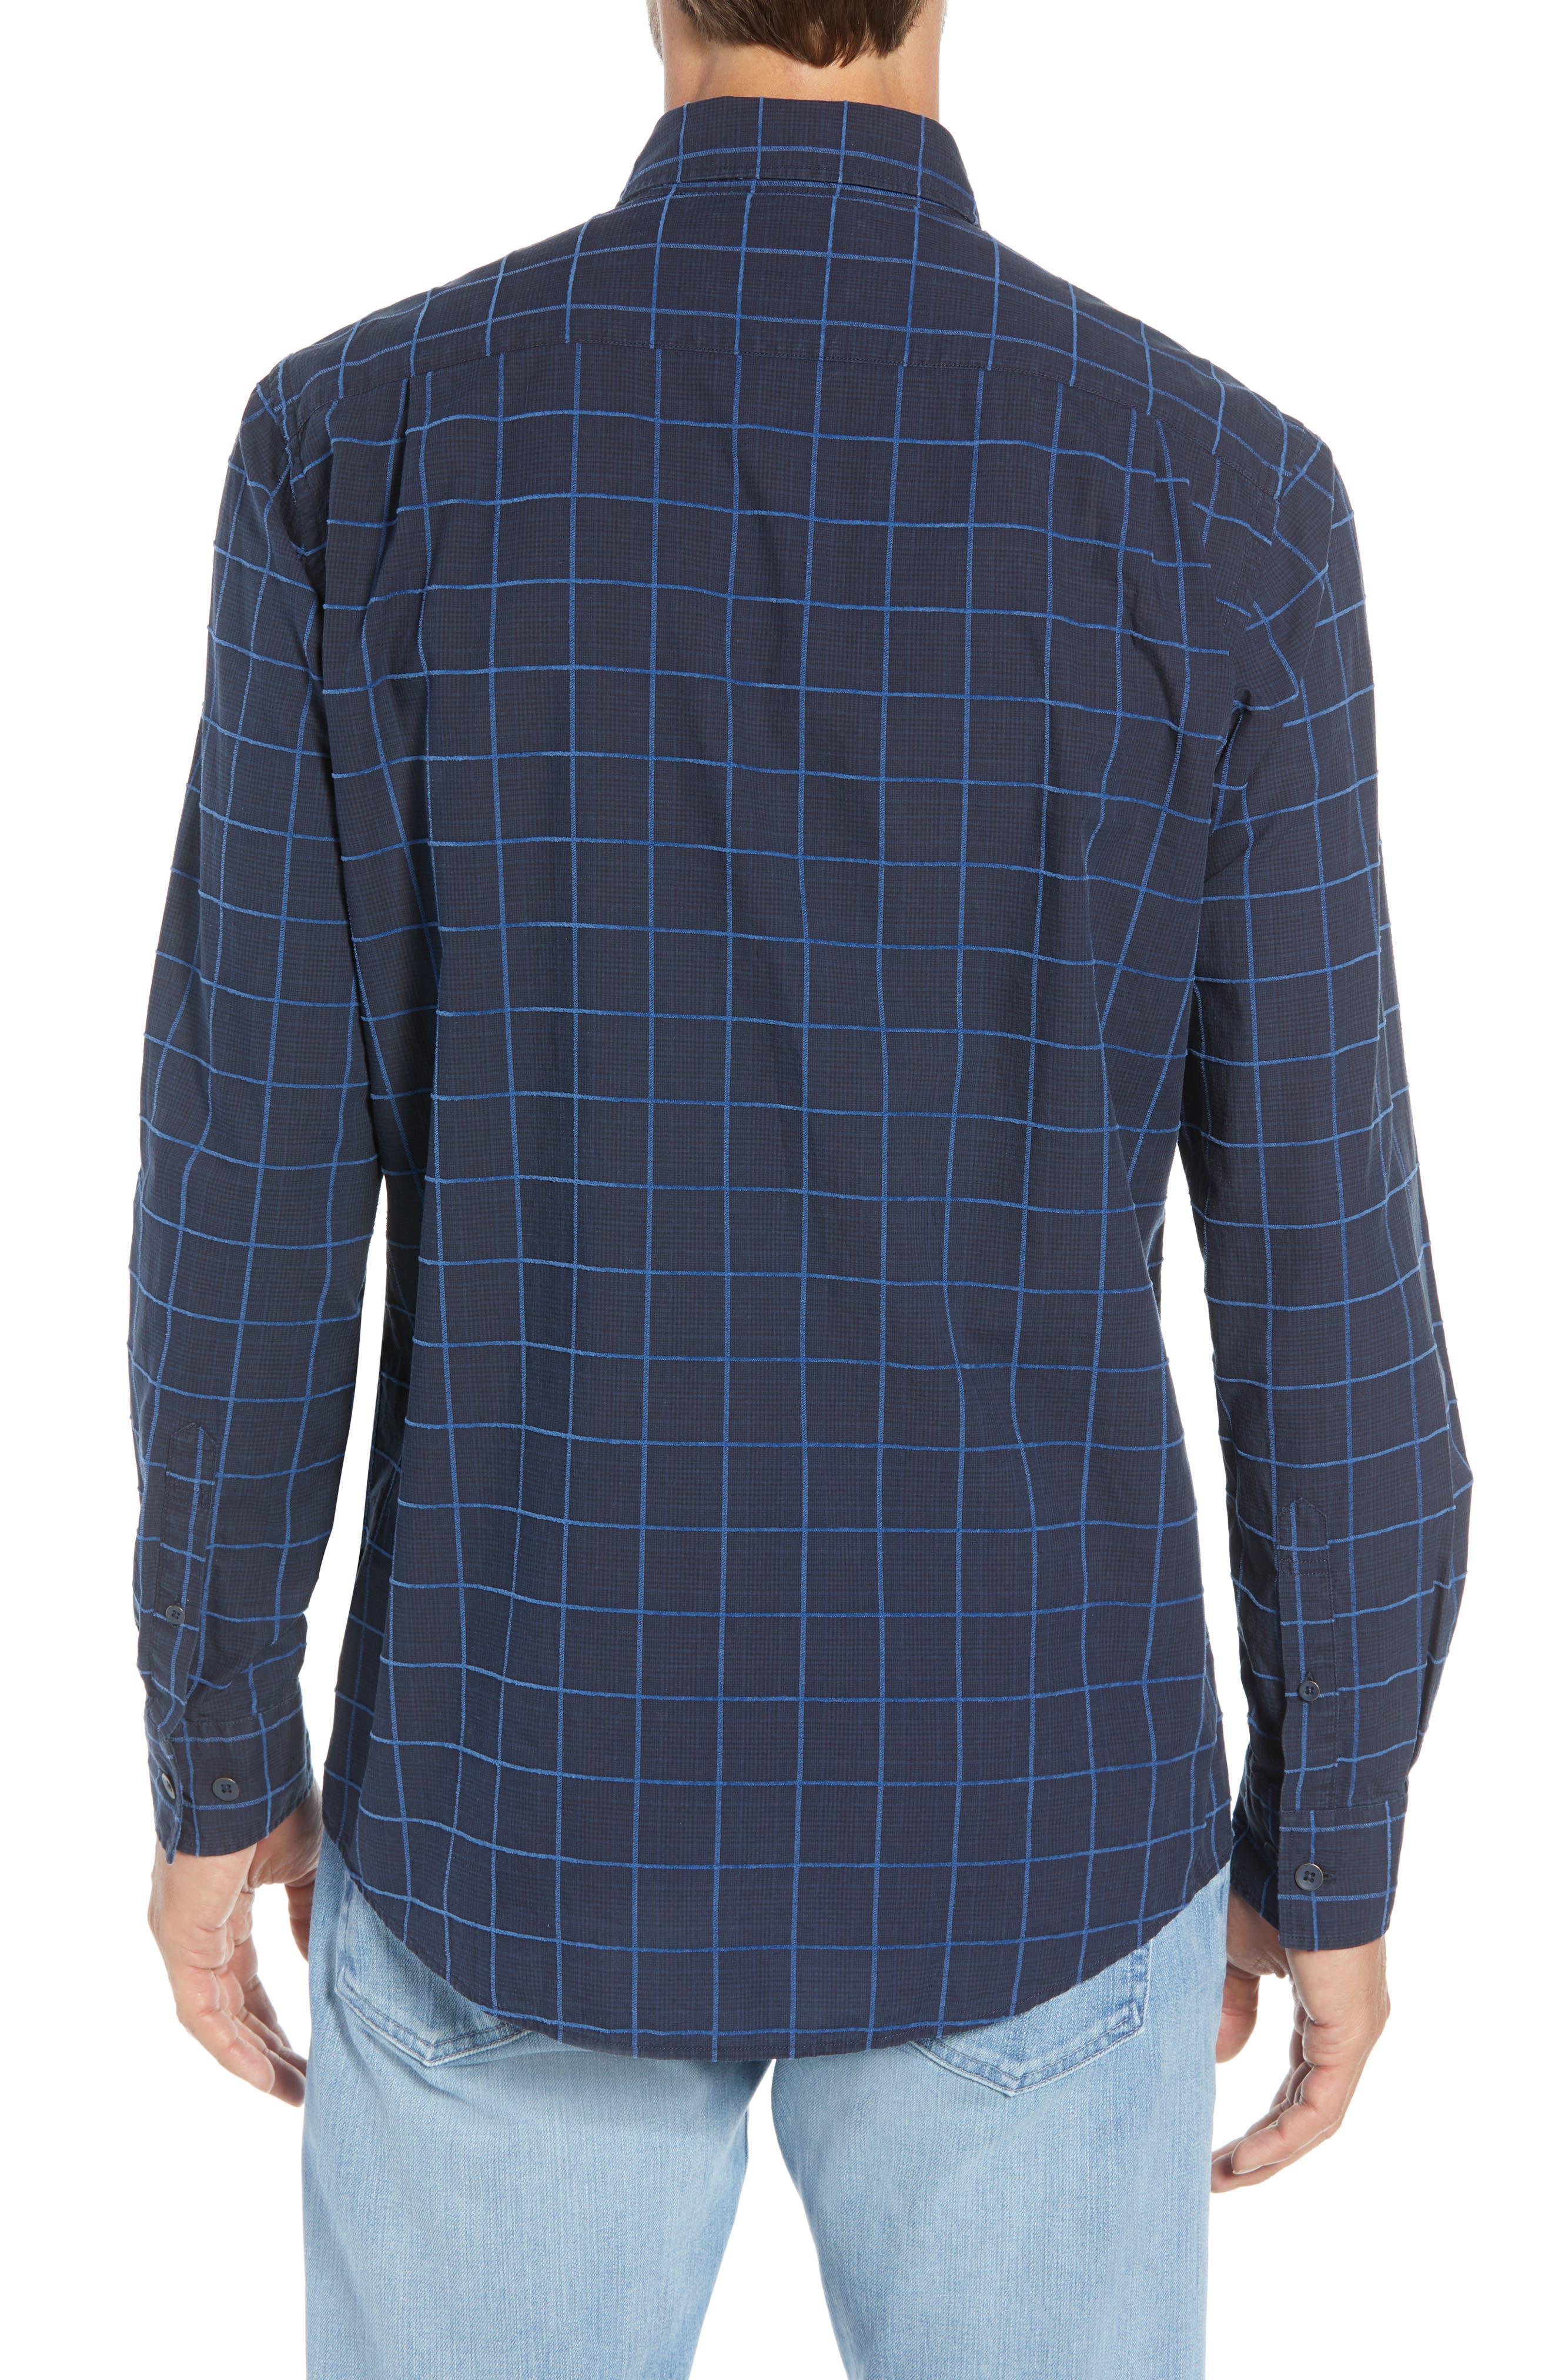 RODD & GUNN, Hindley Creek Regular Fit Sport Shirt, Alternate thumbnail 3, color, NAVY